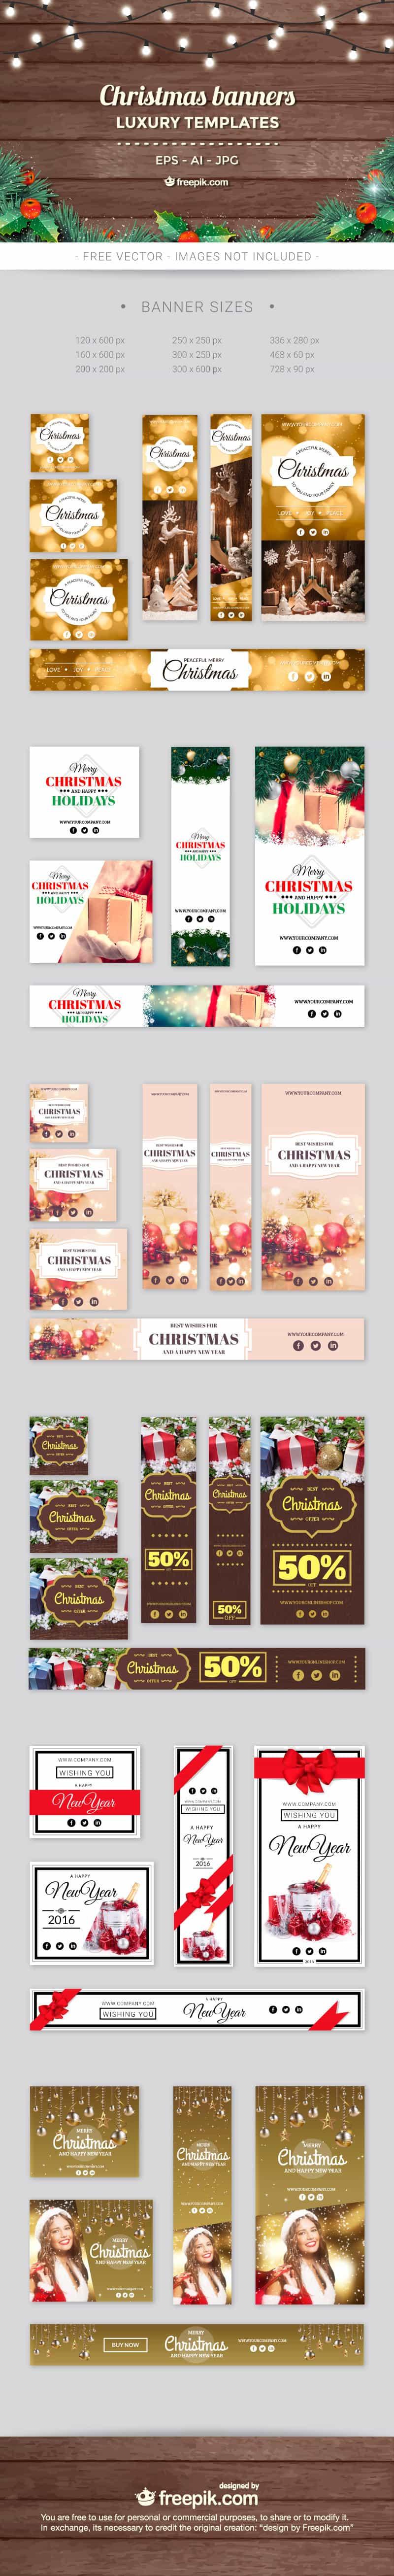 cld christmas freebies banners